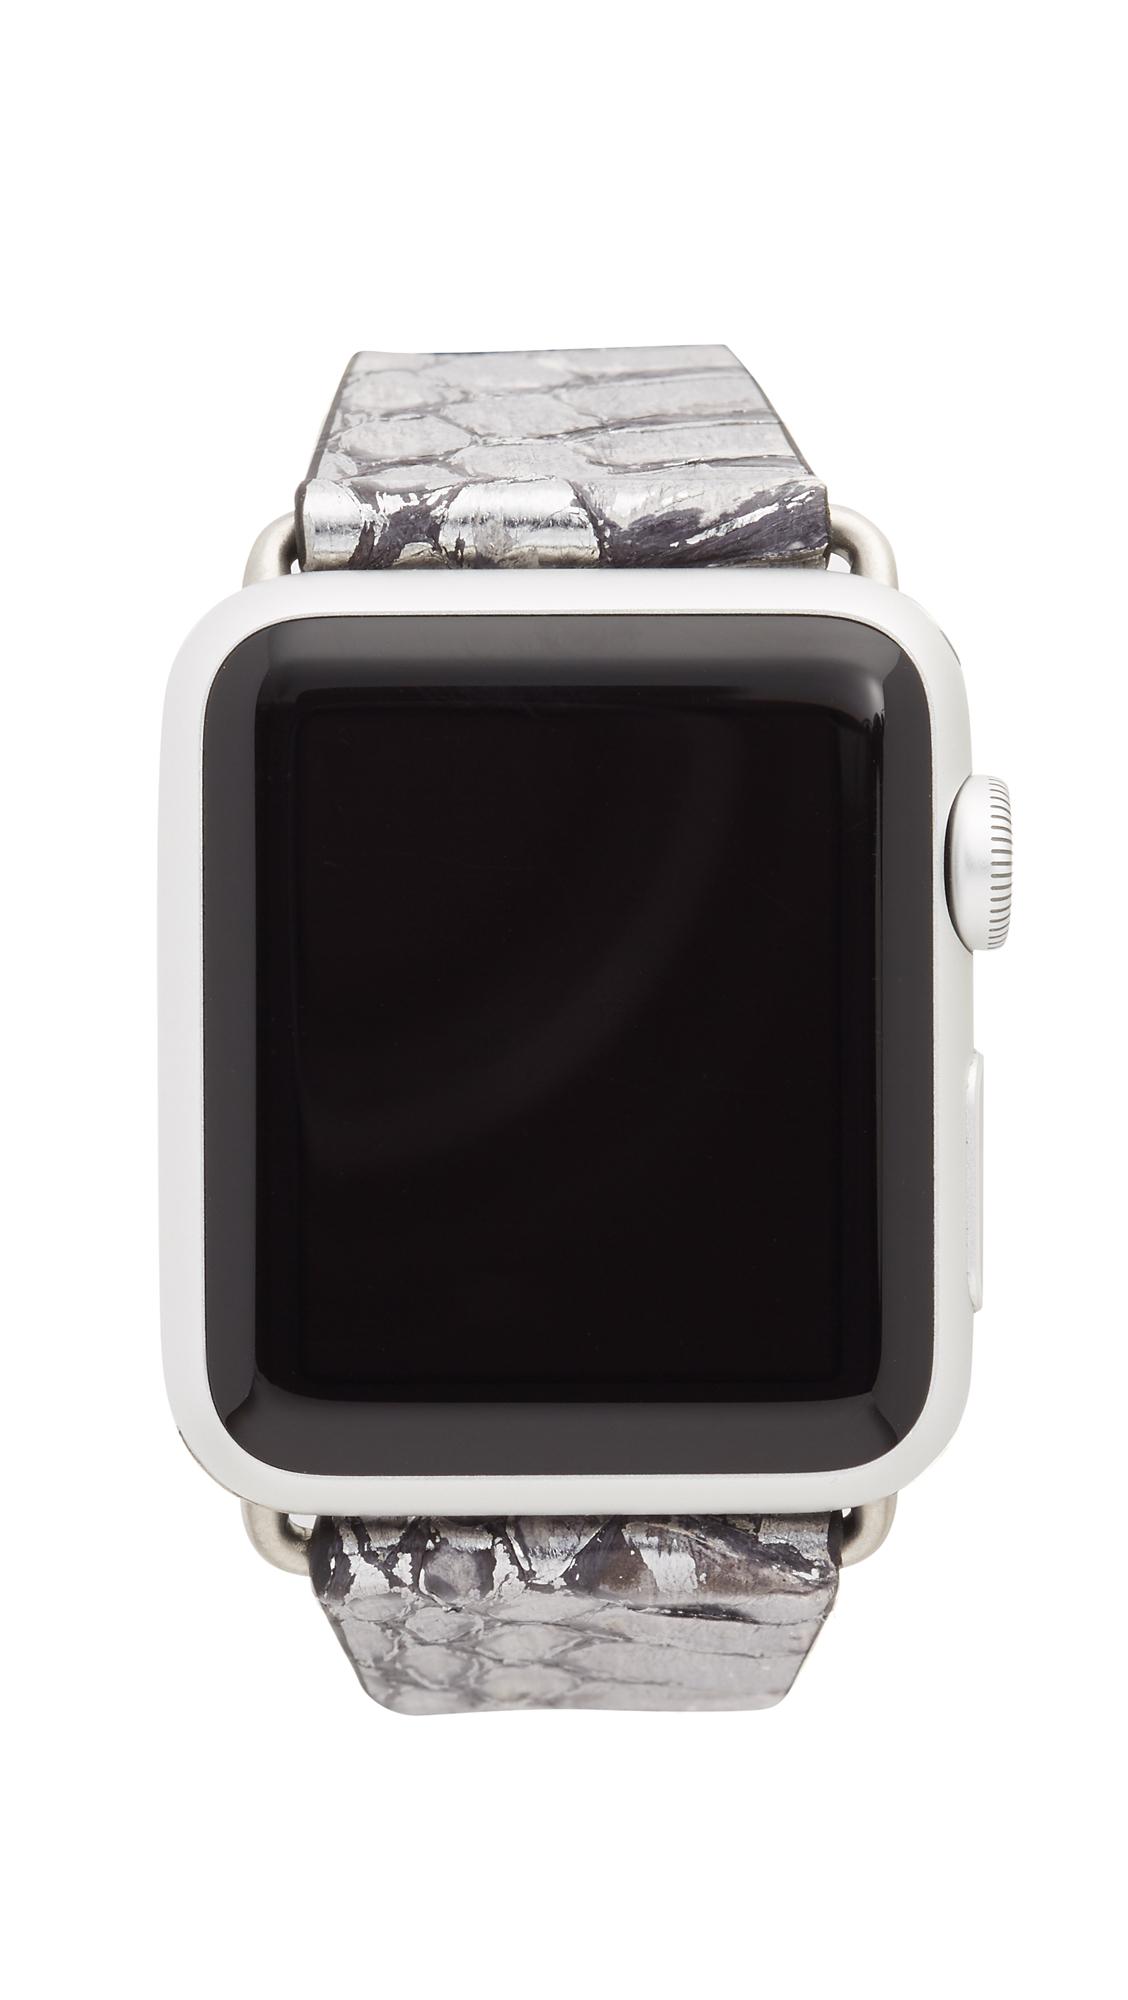 Rebecca Minkoff Snakeskin 38mm Apple Watch Band in